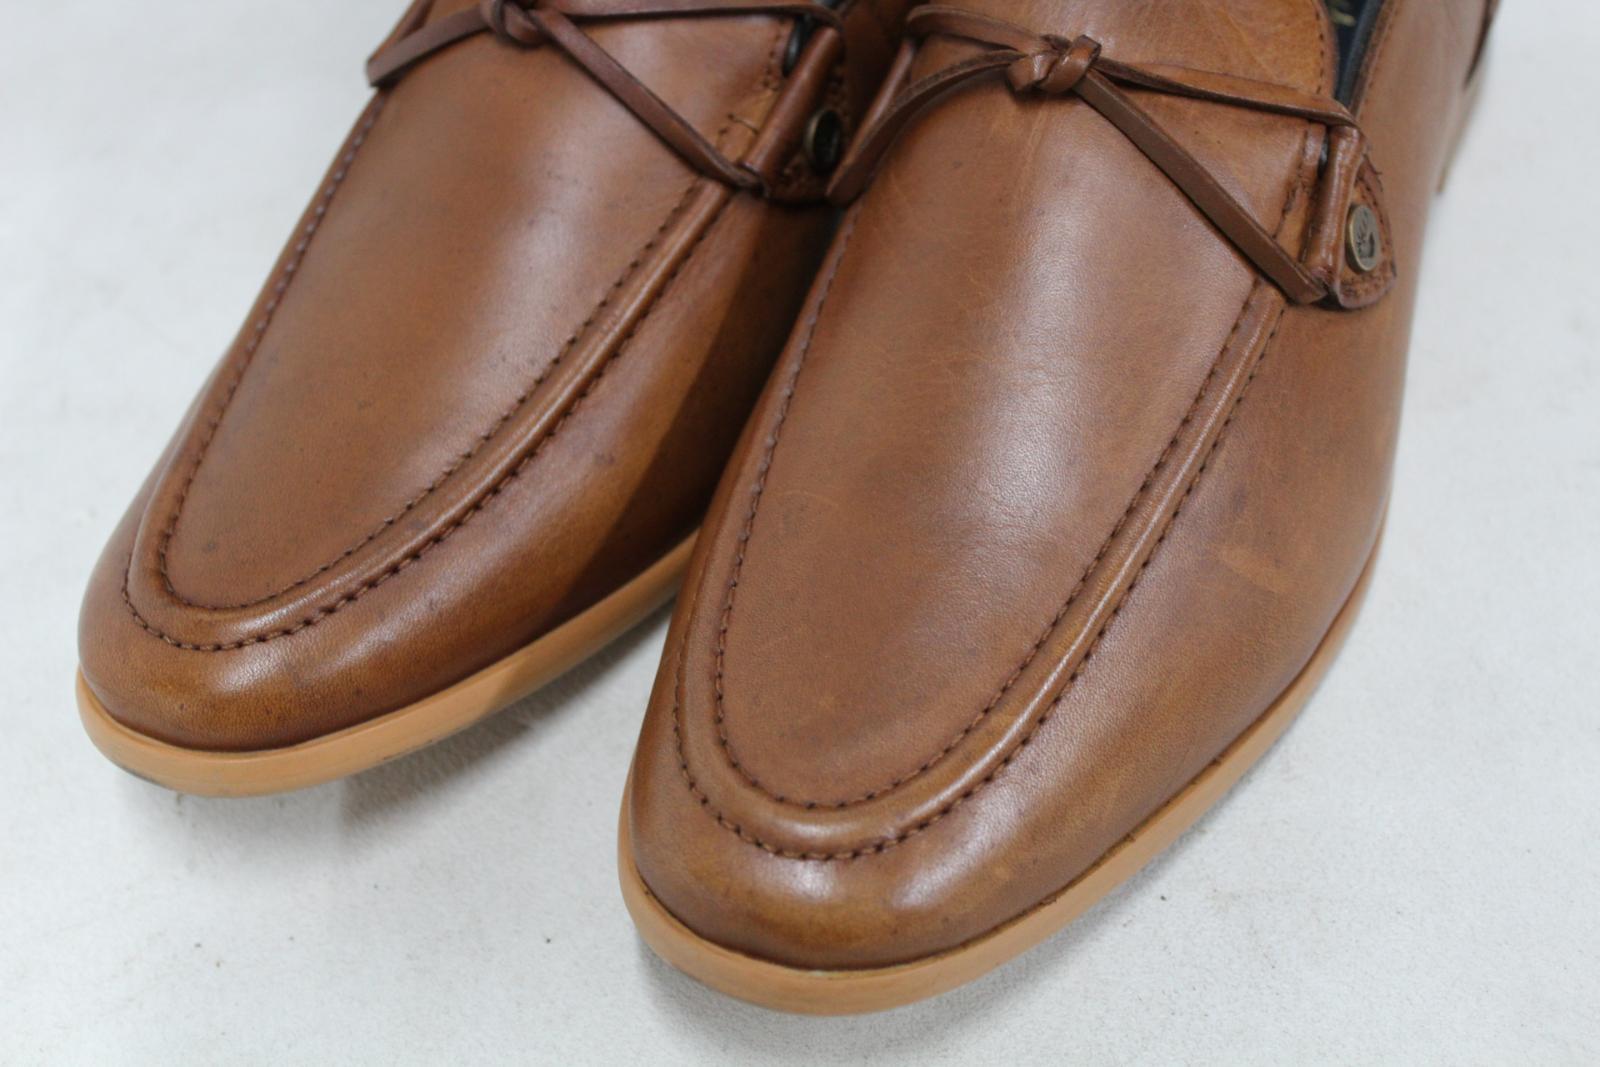 Goodwin-Smith-Para-Hombre-Napoli-Tanga-Zapato-Marron-Sin-Cordones-Mocasin-Cuero-UK8-EU42-Nuevo miniatura 10